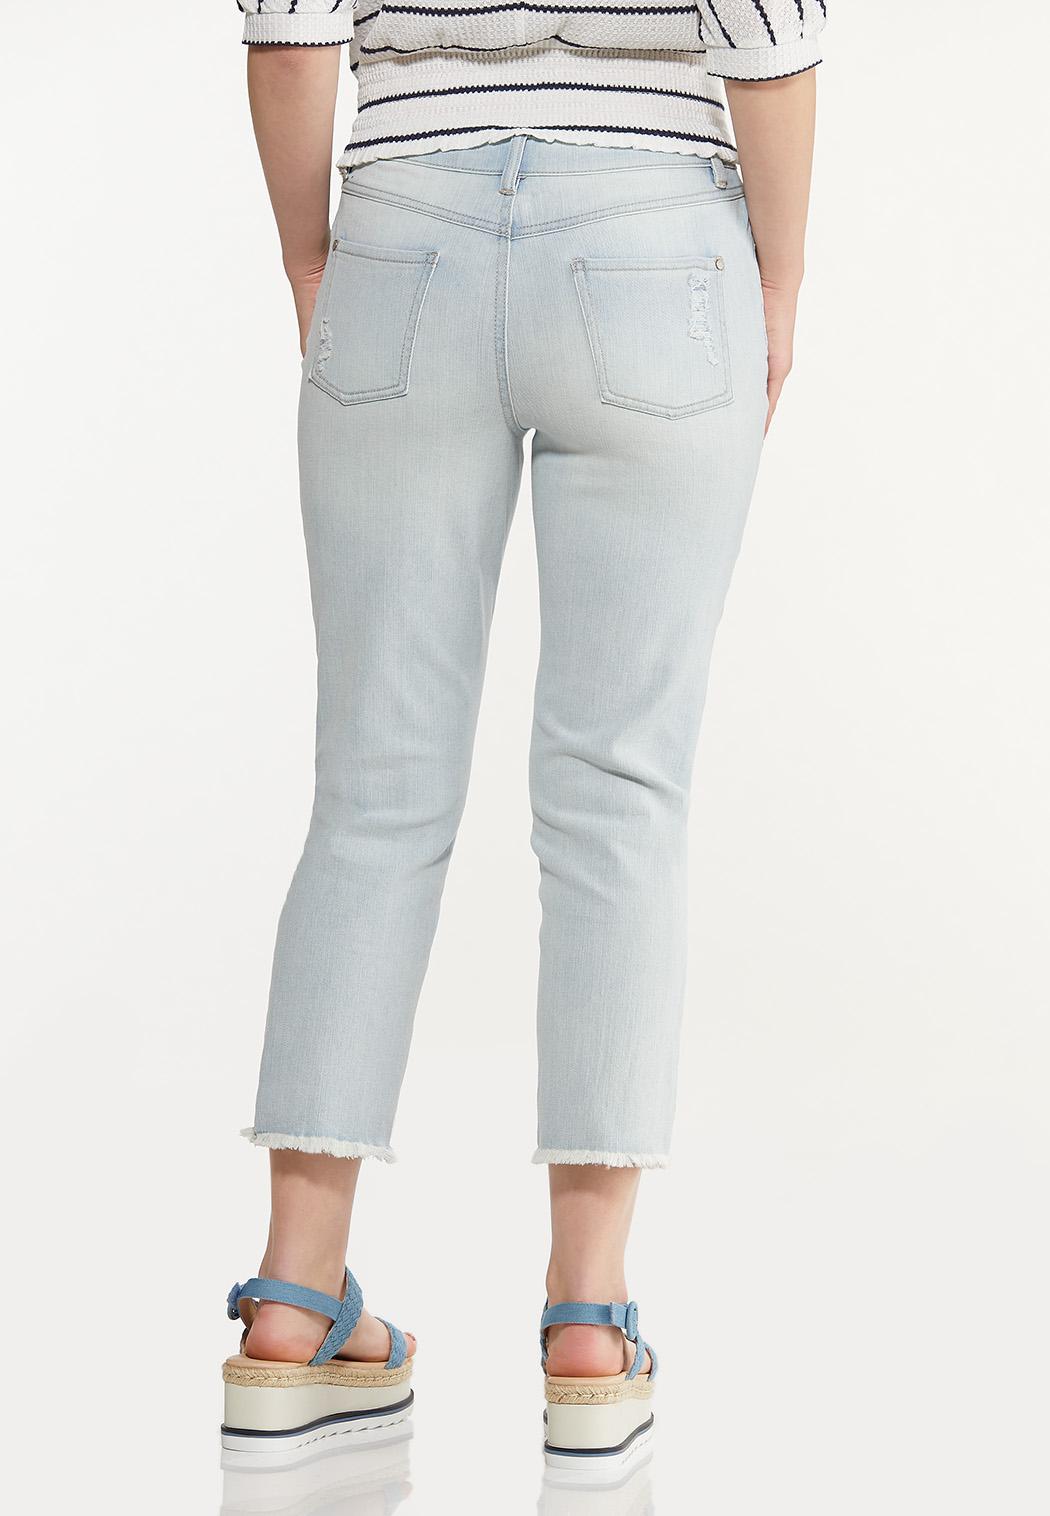 Distressed Lightwash Jeans (Item #44573668)